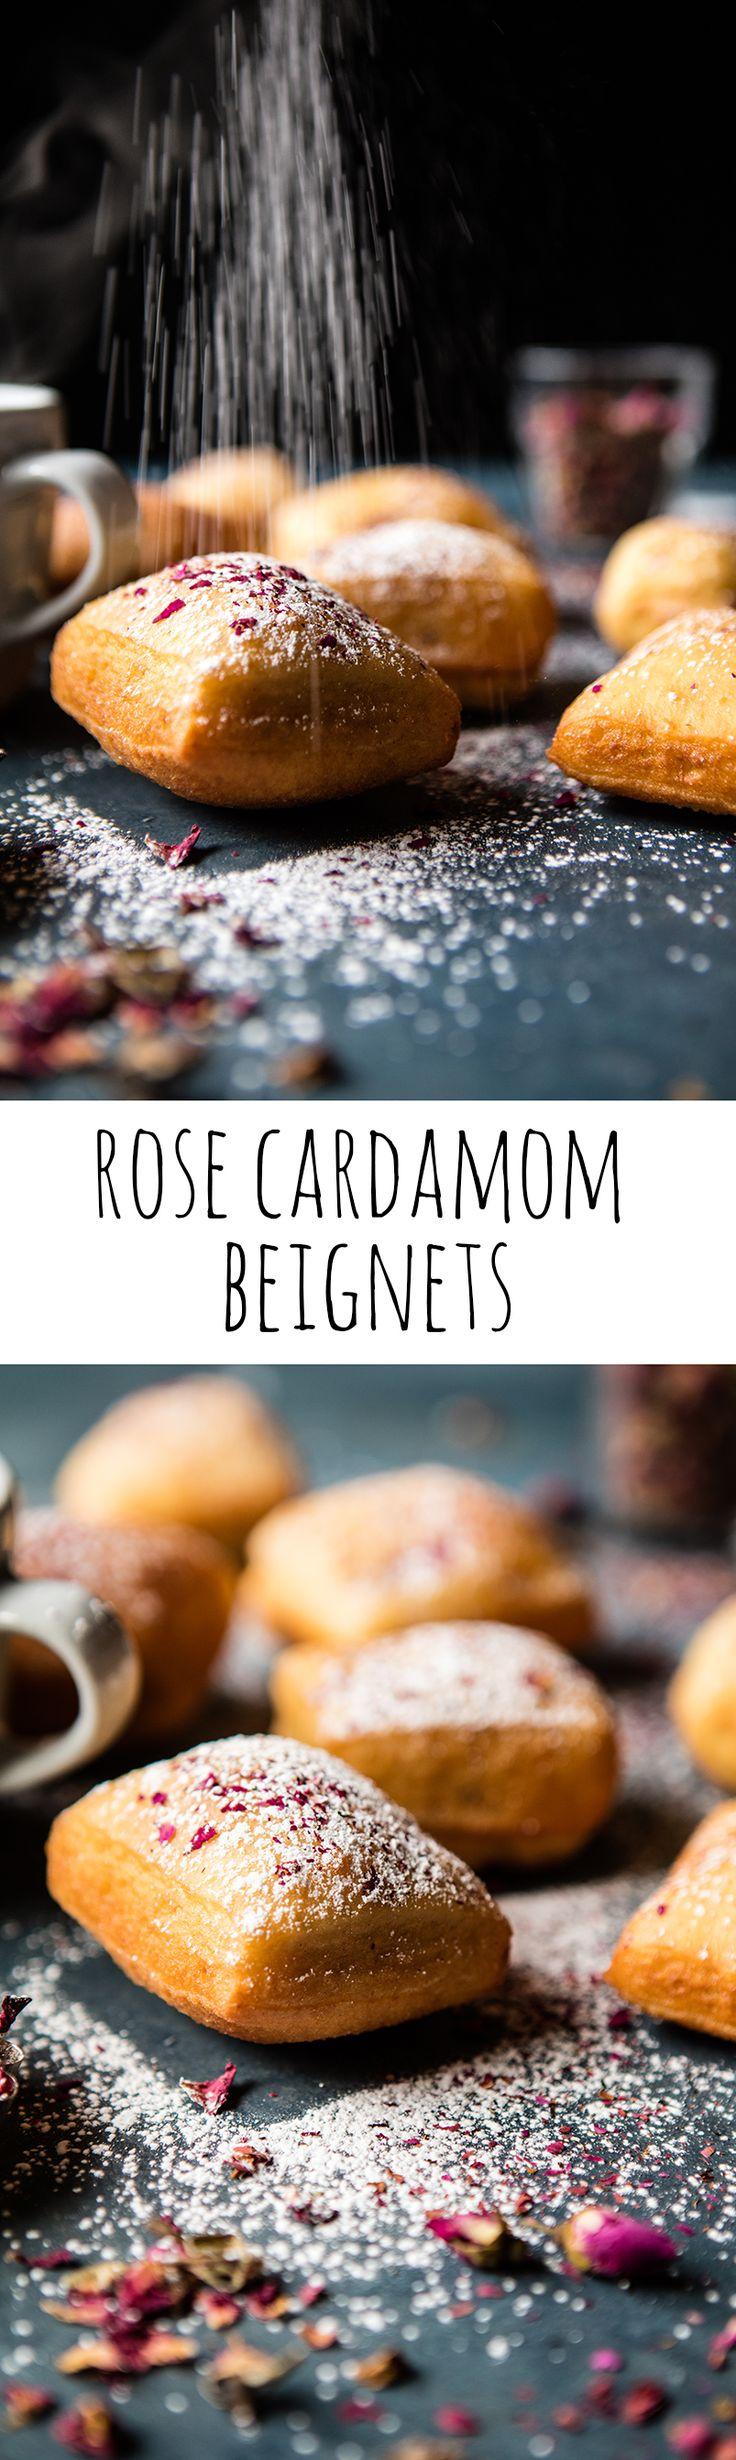 Cardamom Rose Beignets | halfbakedharvest.com @hbharvest